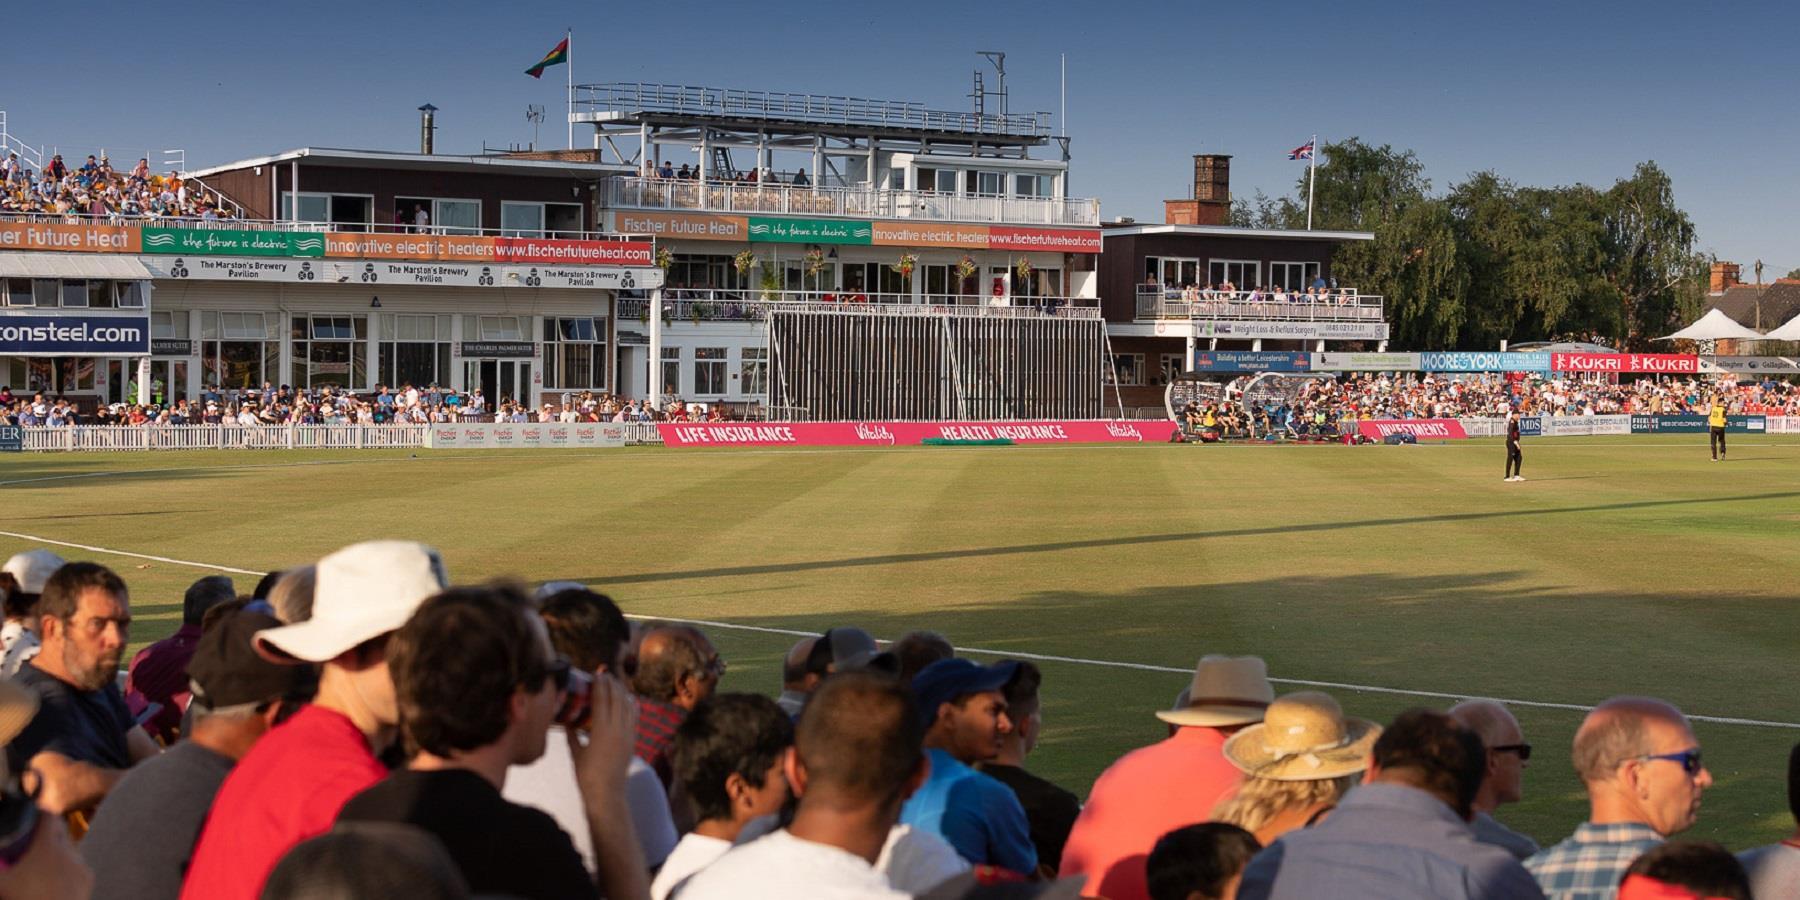 Crowd watching cricket match